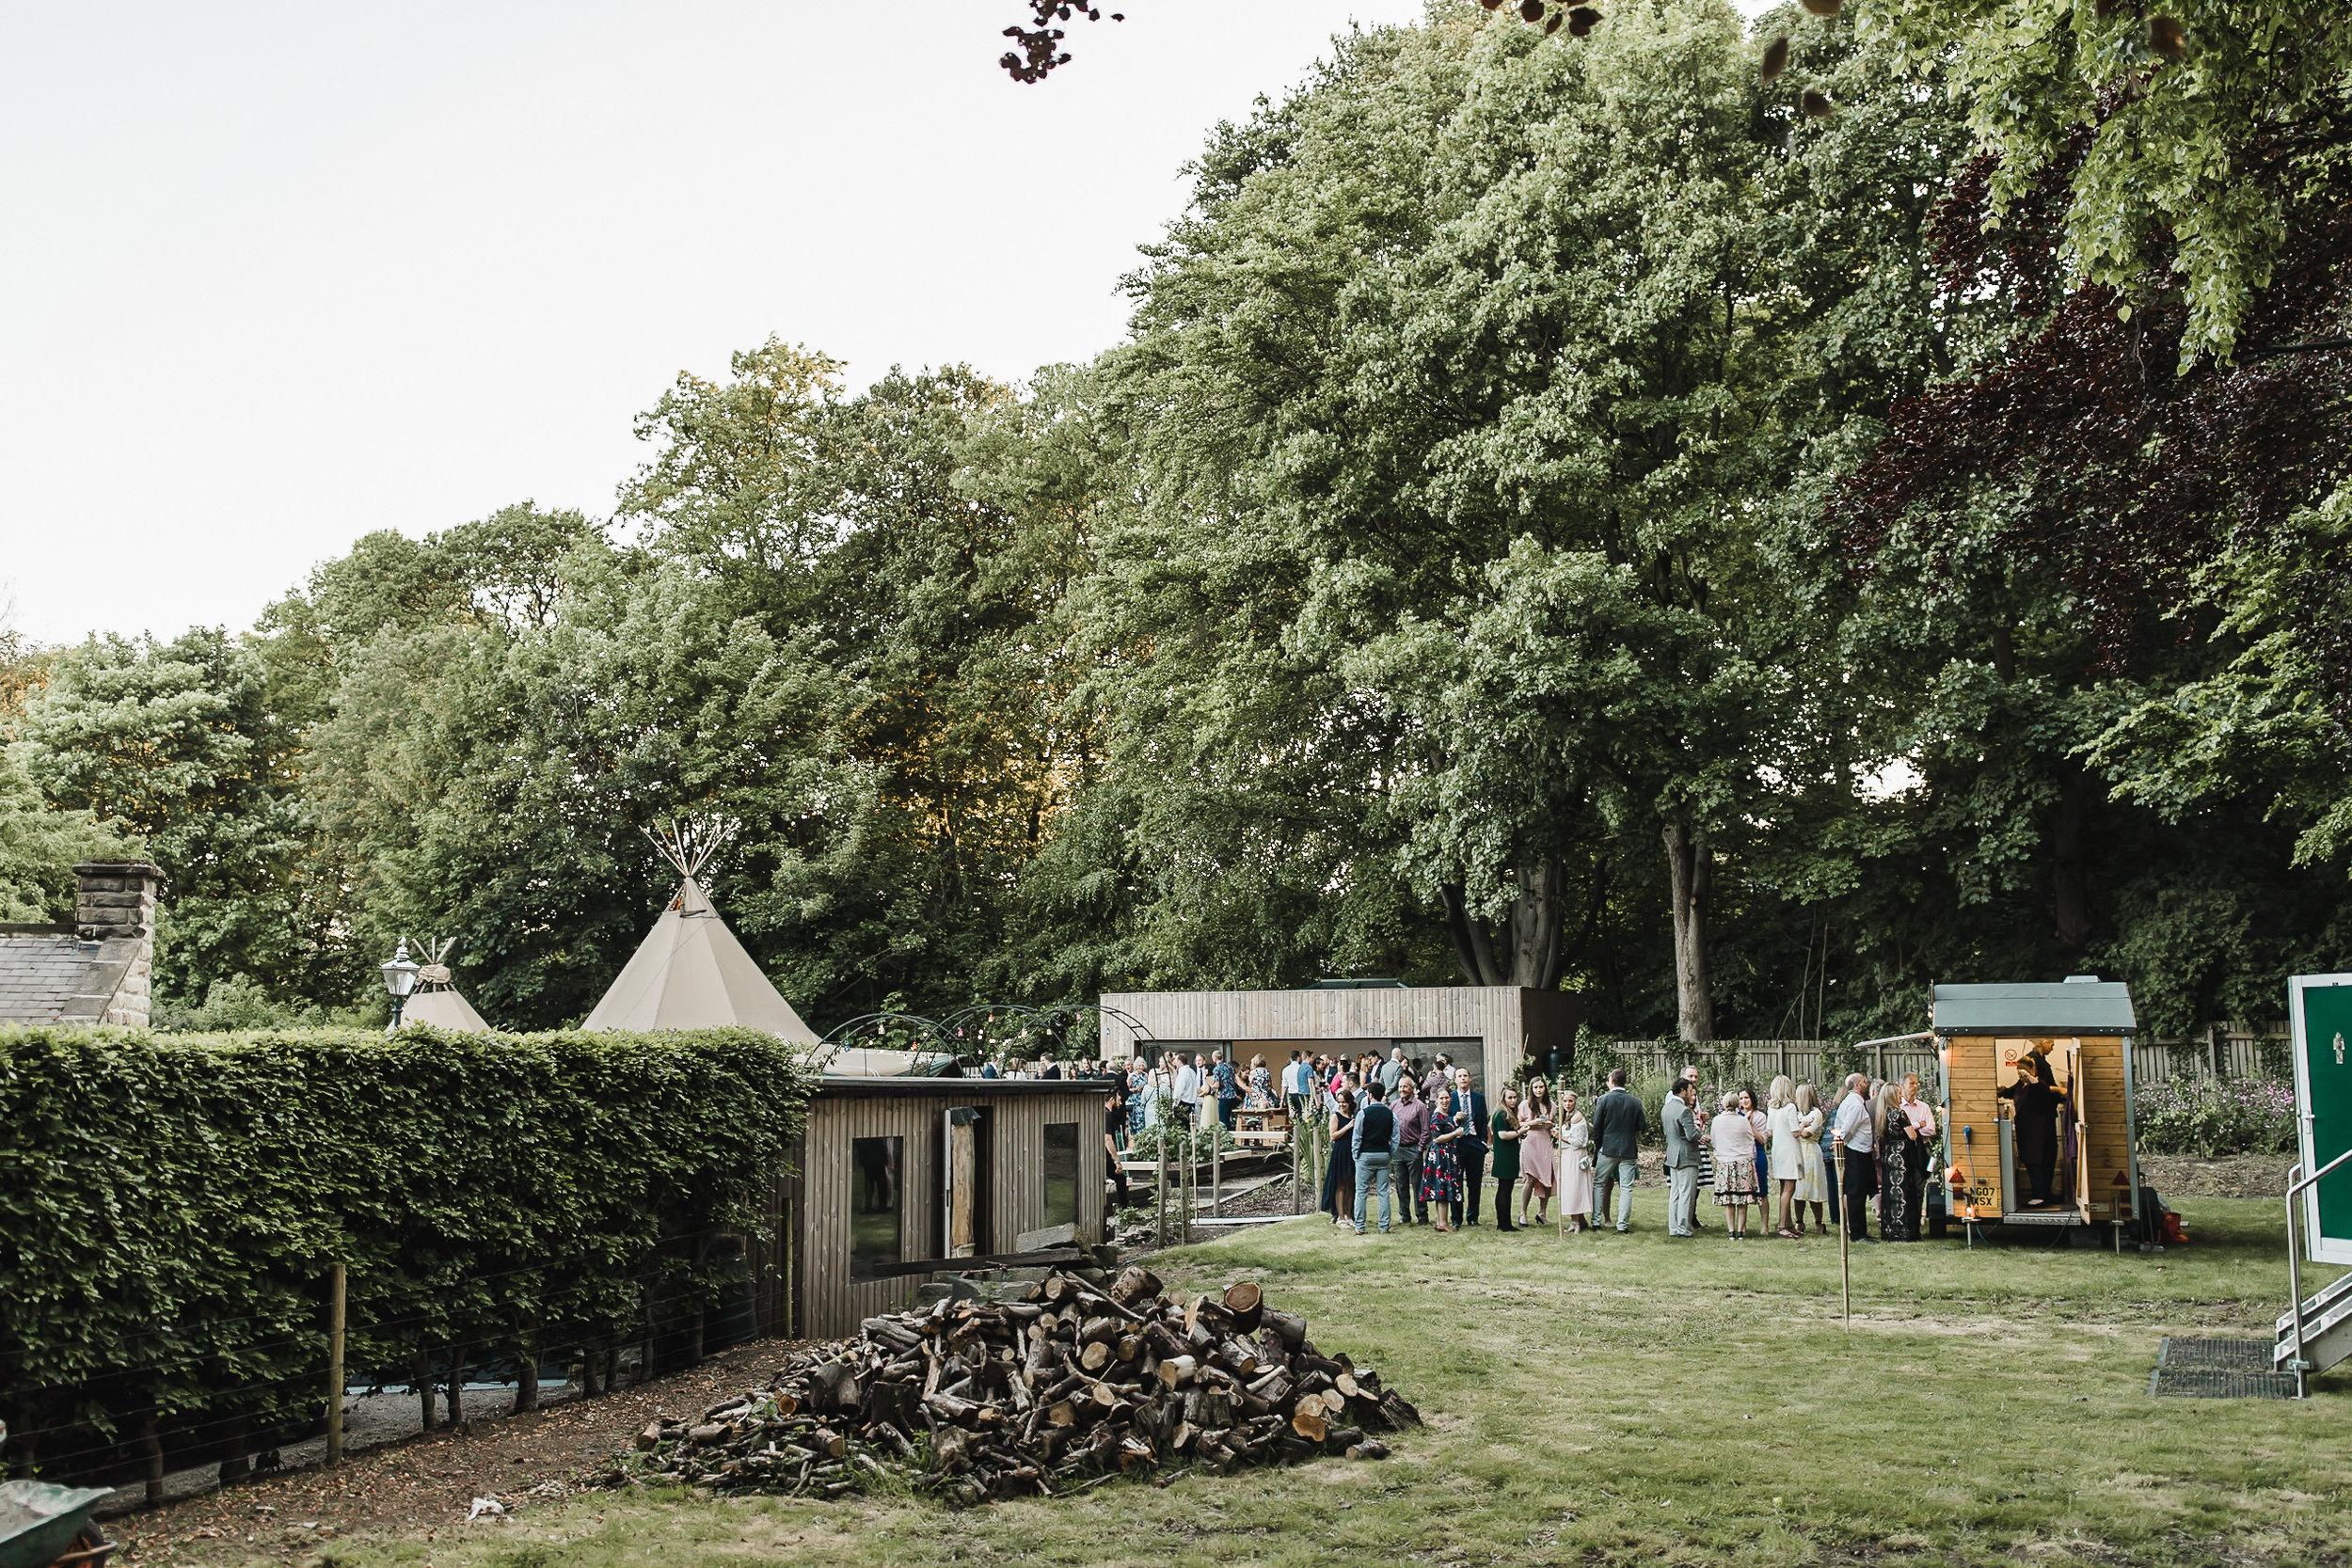 Roundhay-Leeds-Backyard-Wedding-Becs-Chris-224.jpg